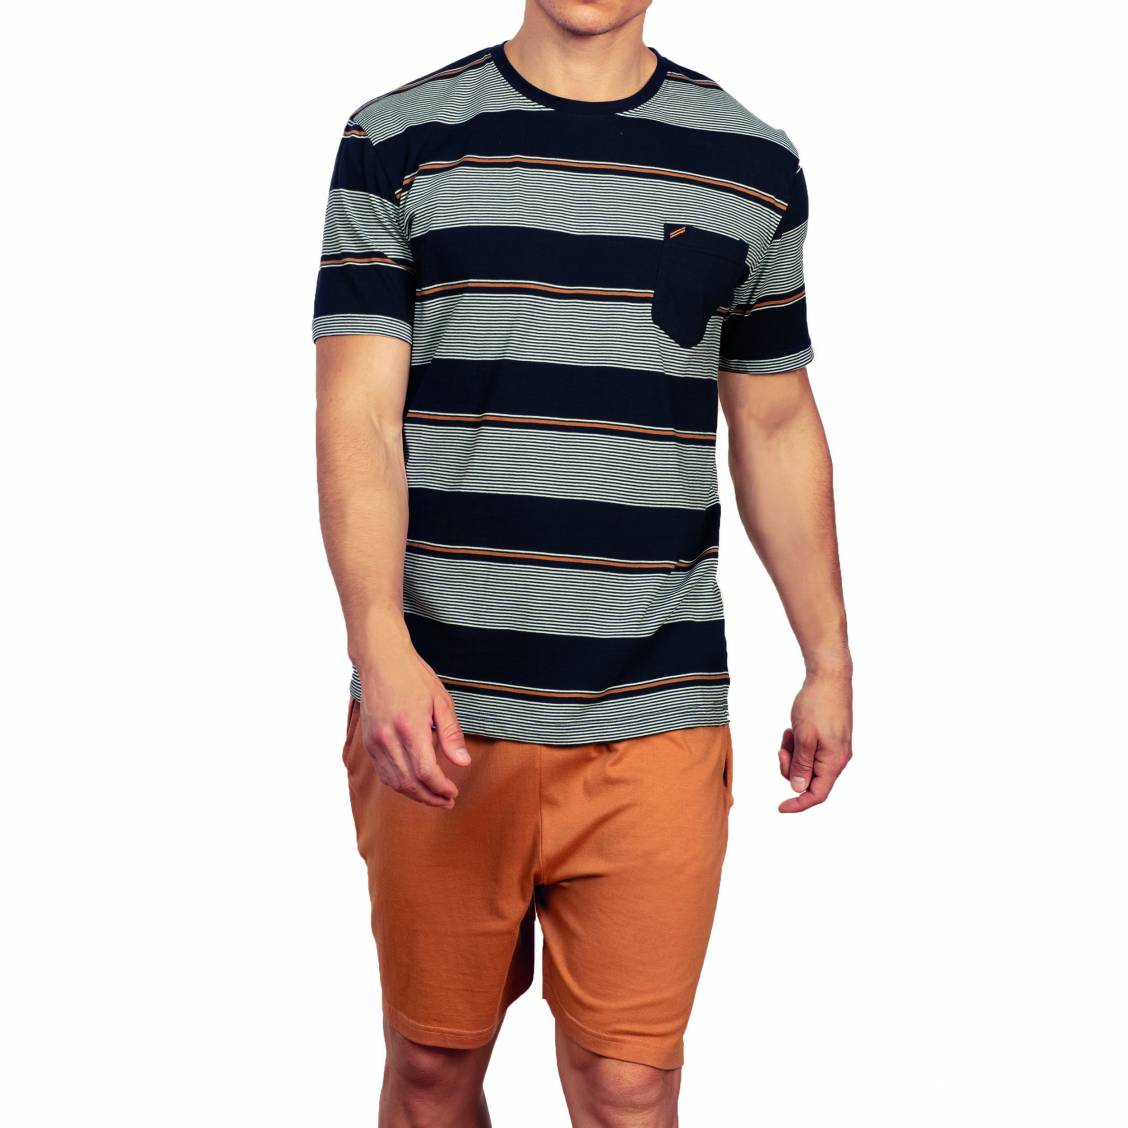 Pyjama court Hechter Studio en coton : tee-shirt col rond bleu marine rayé et short marron